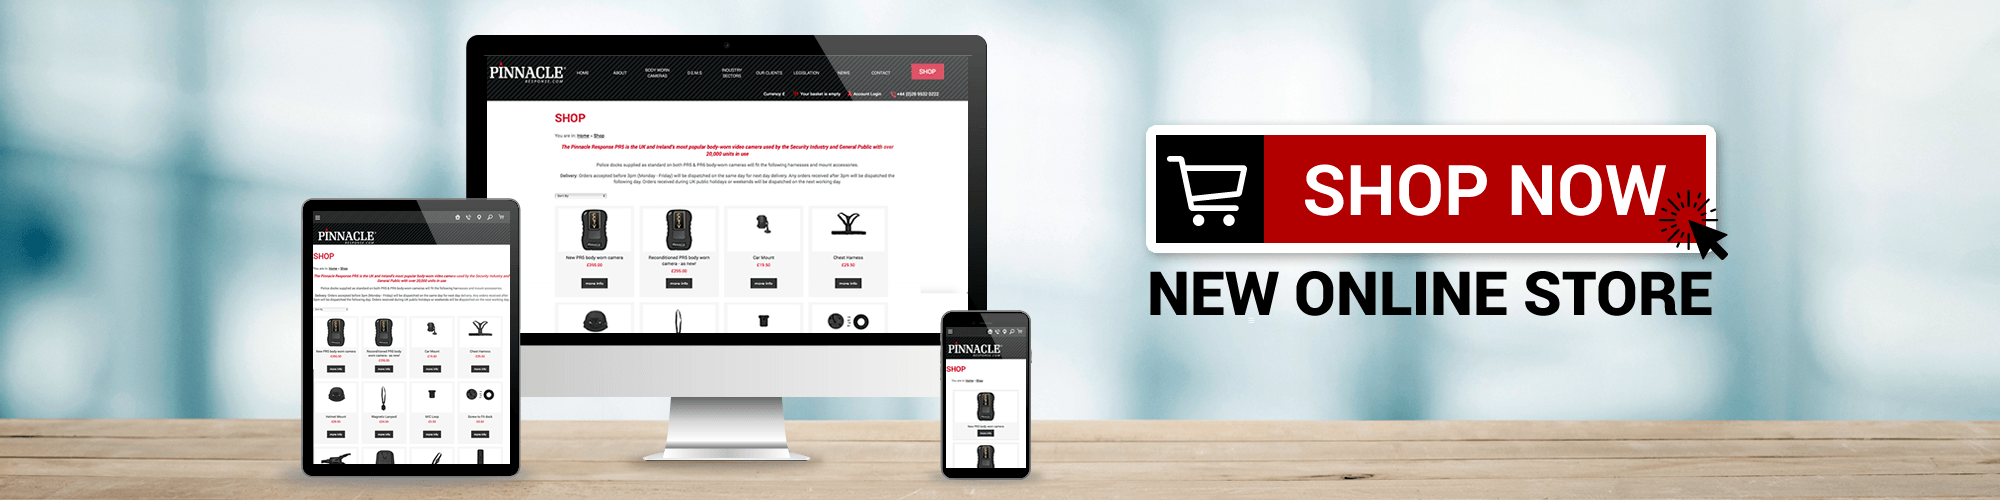 online shop now open